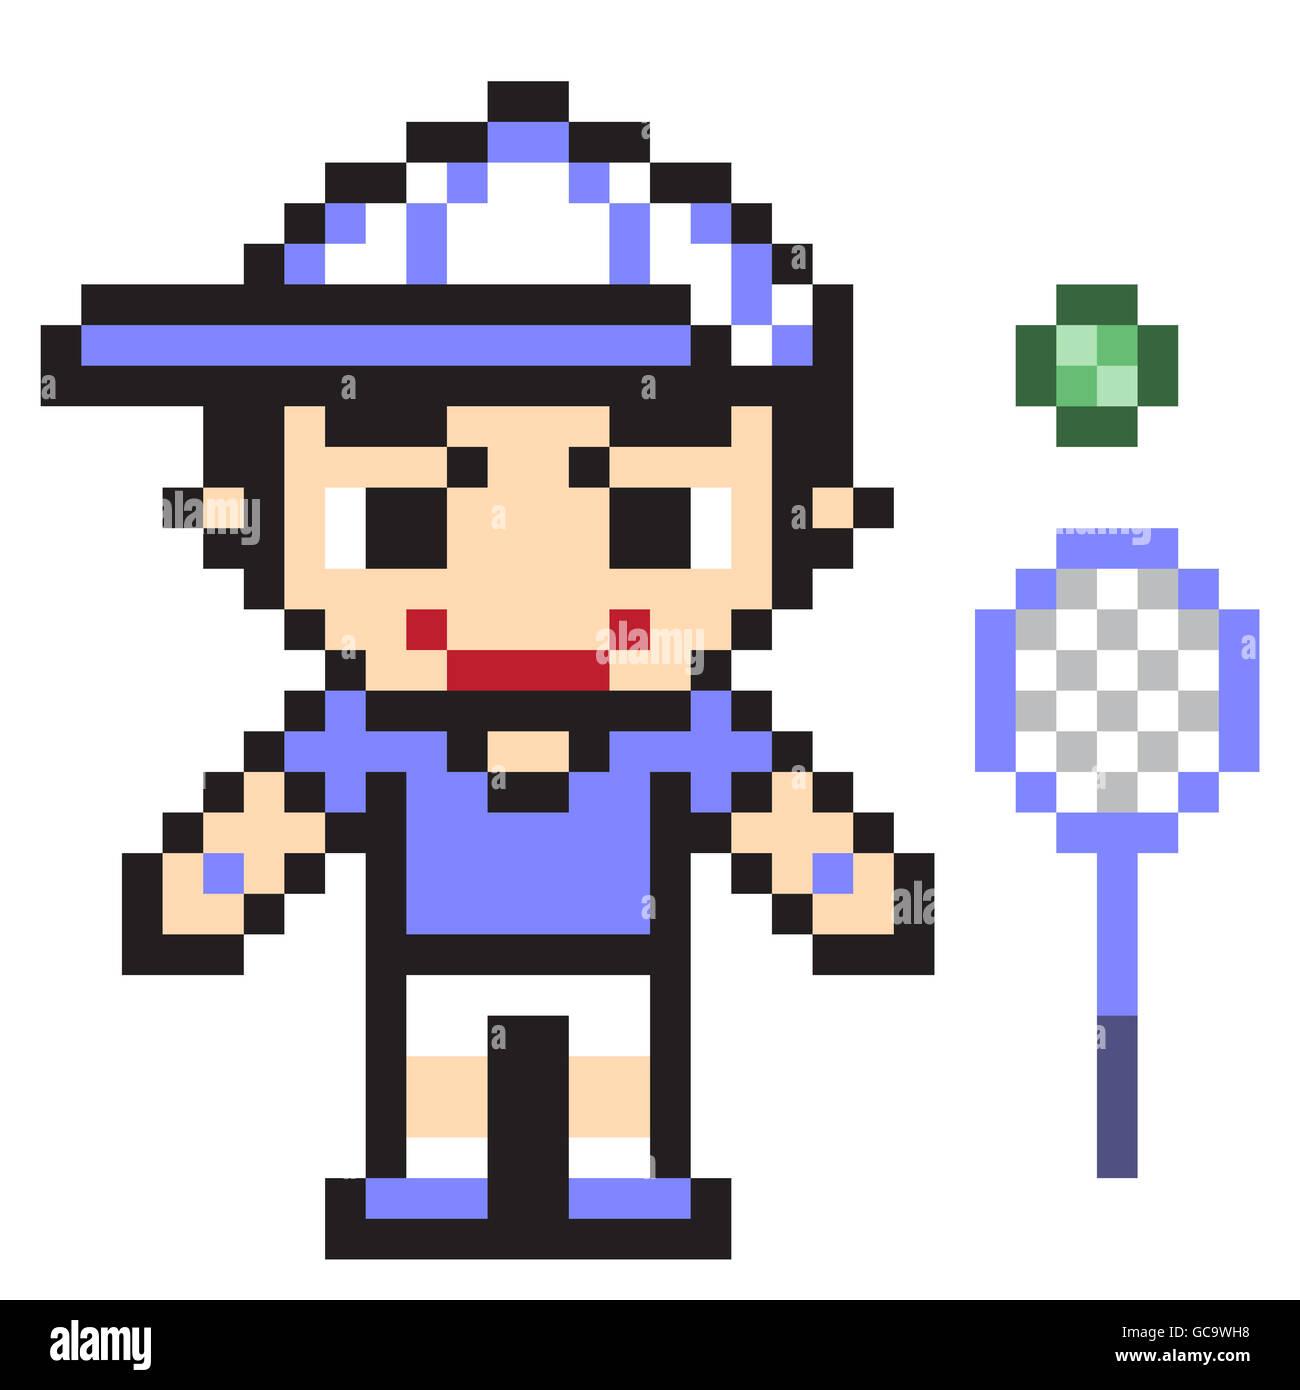 Pixel Art Design : Illustration design pixel art tennis stock photo